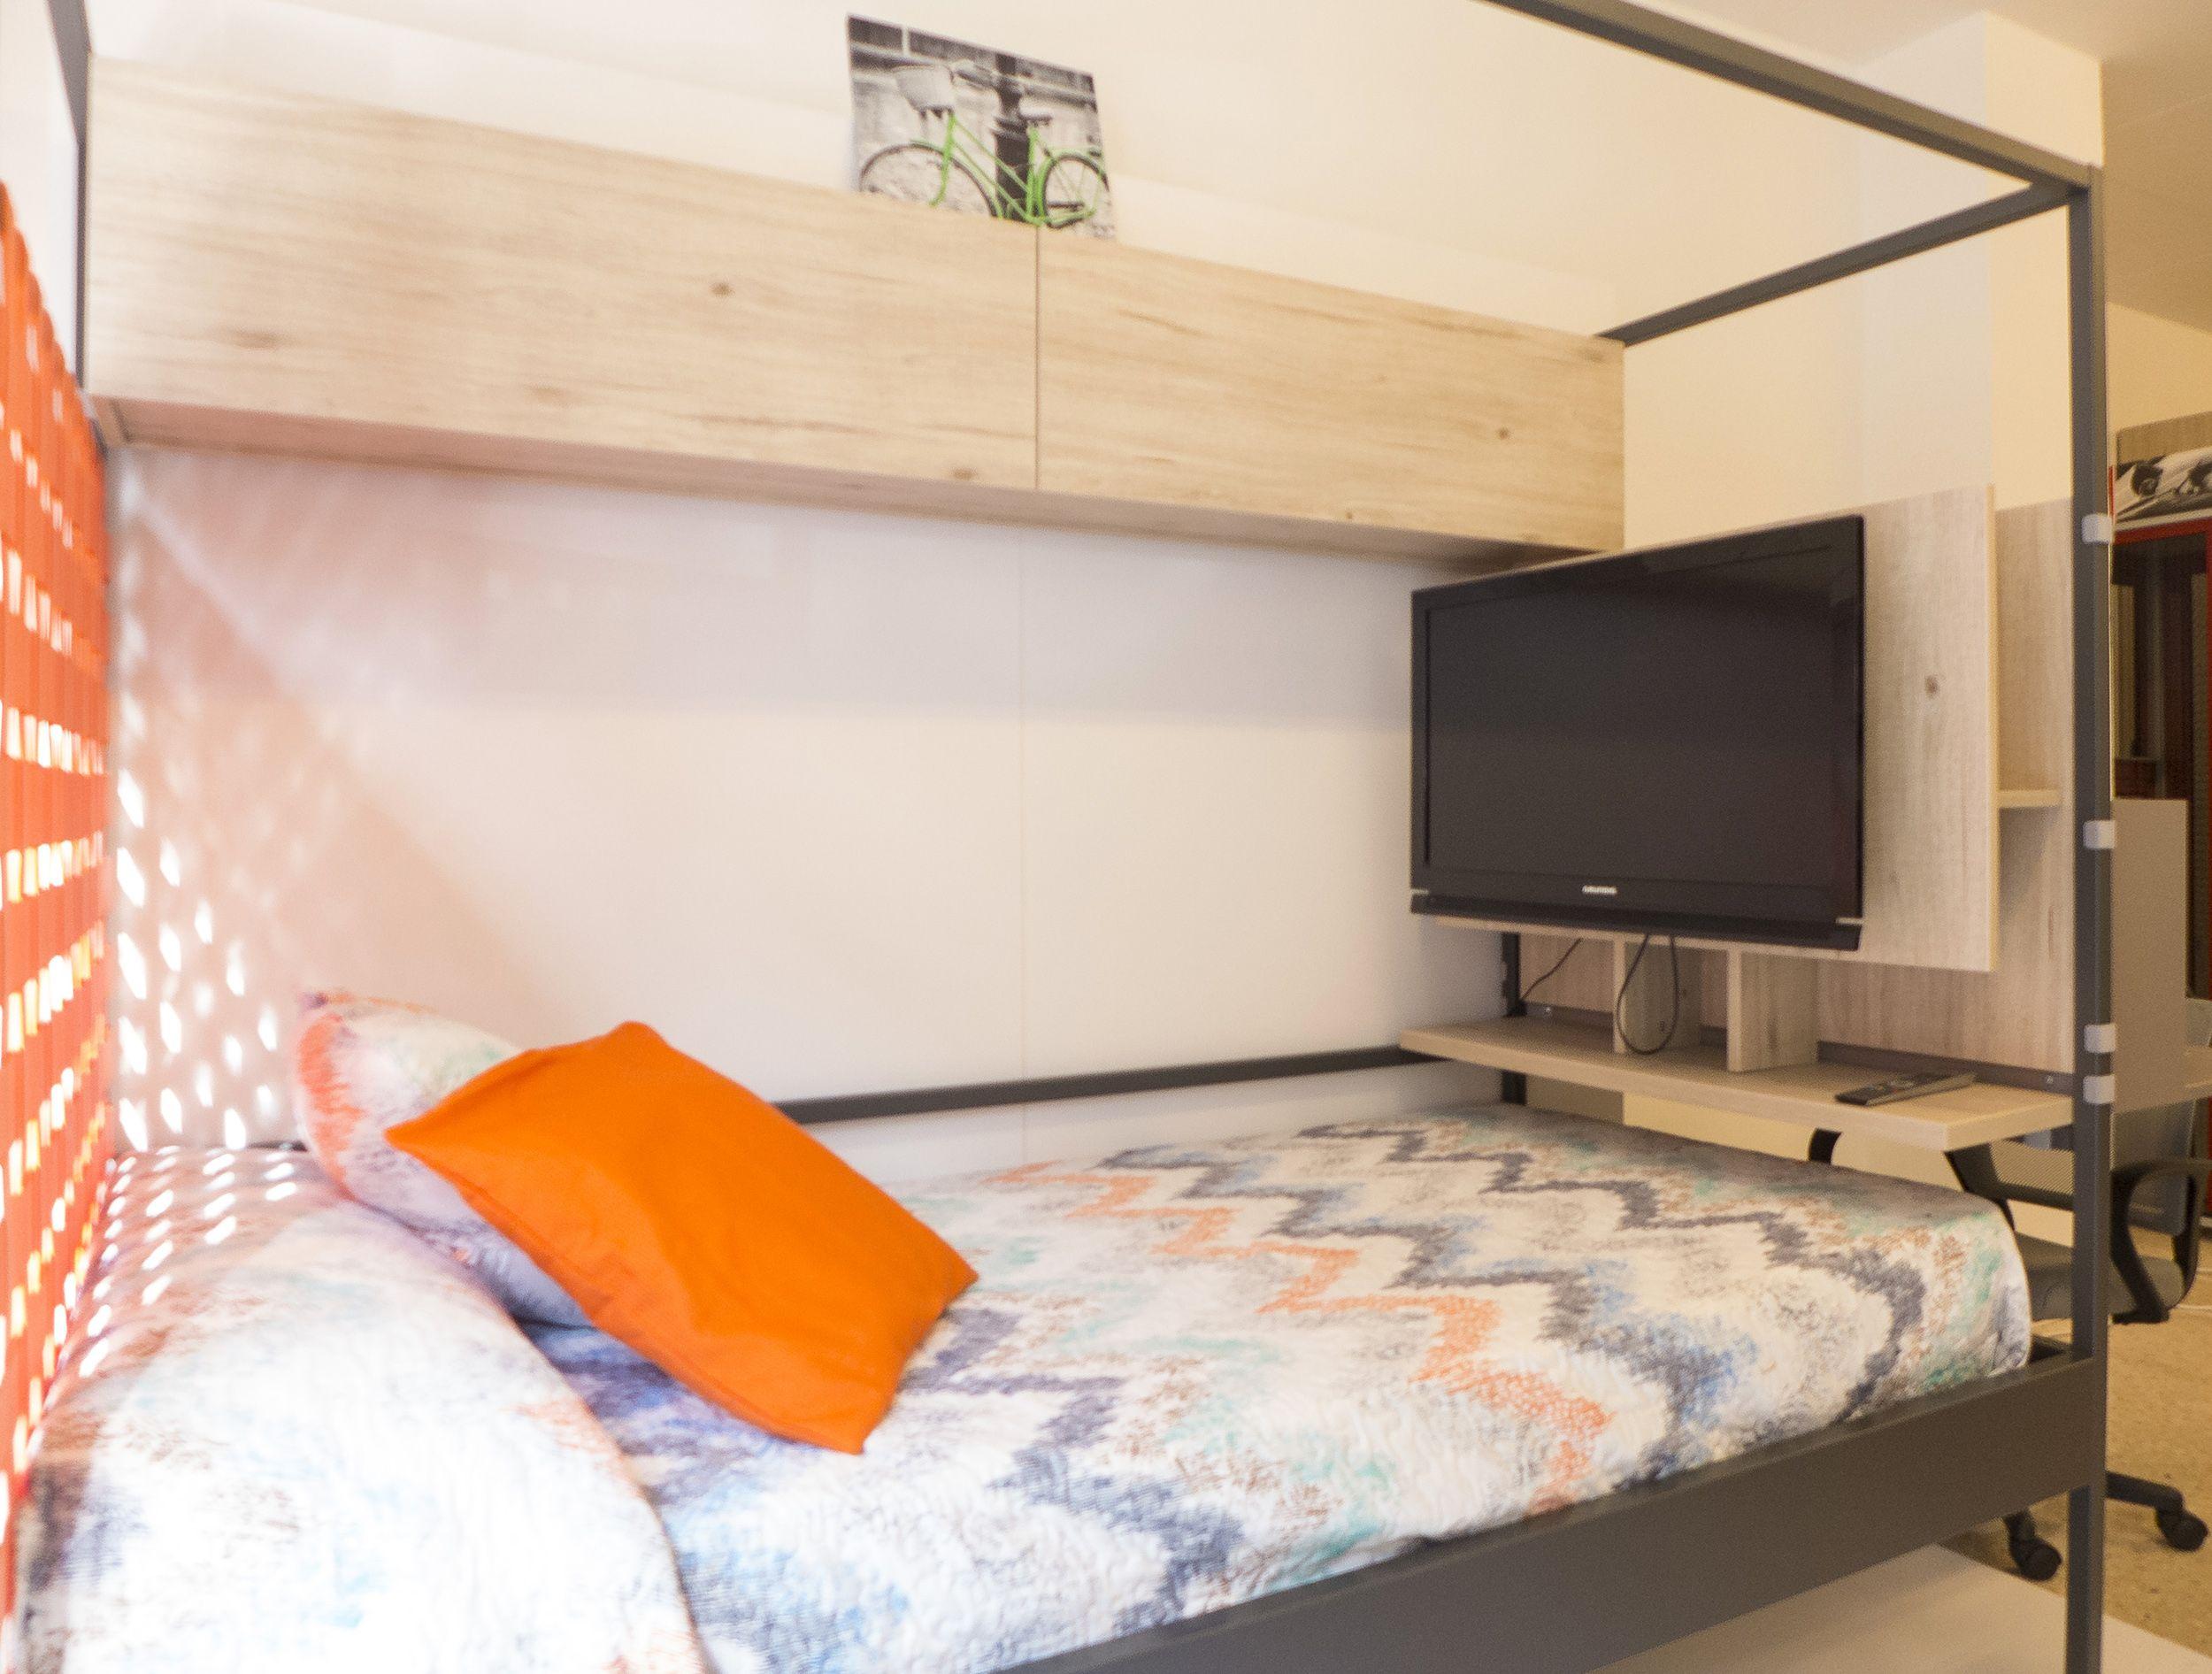 Dormitorios para espacios reducidos en Sarriá Sant Gervasi, Barcelona